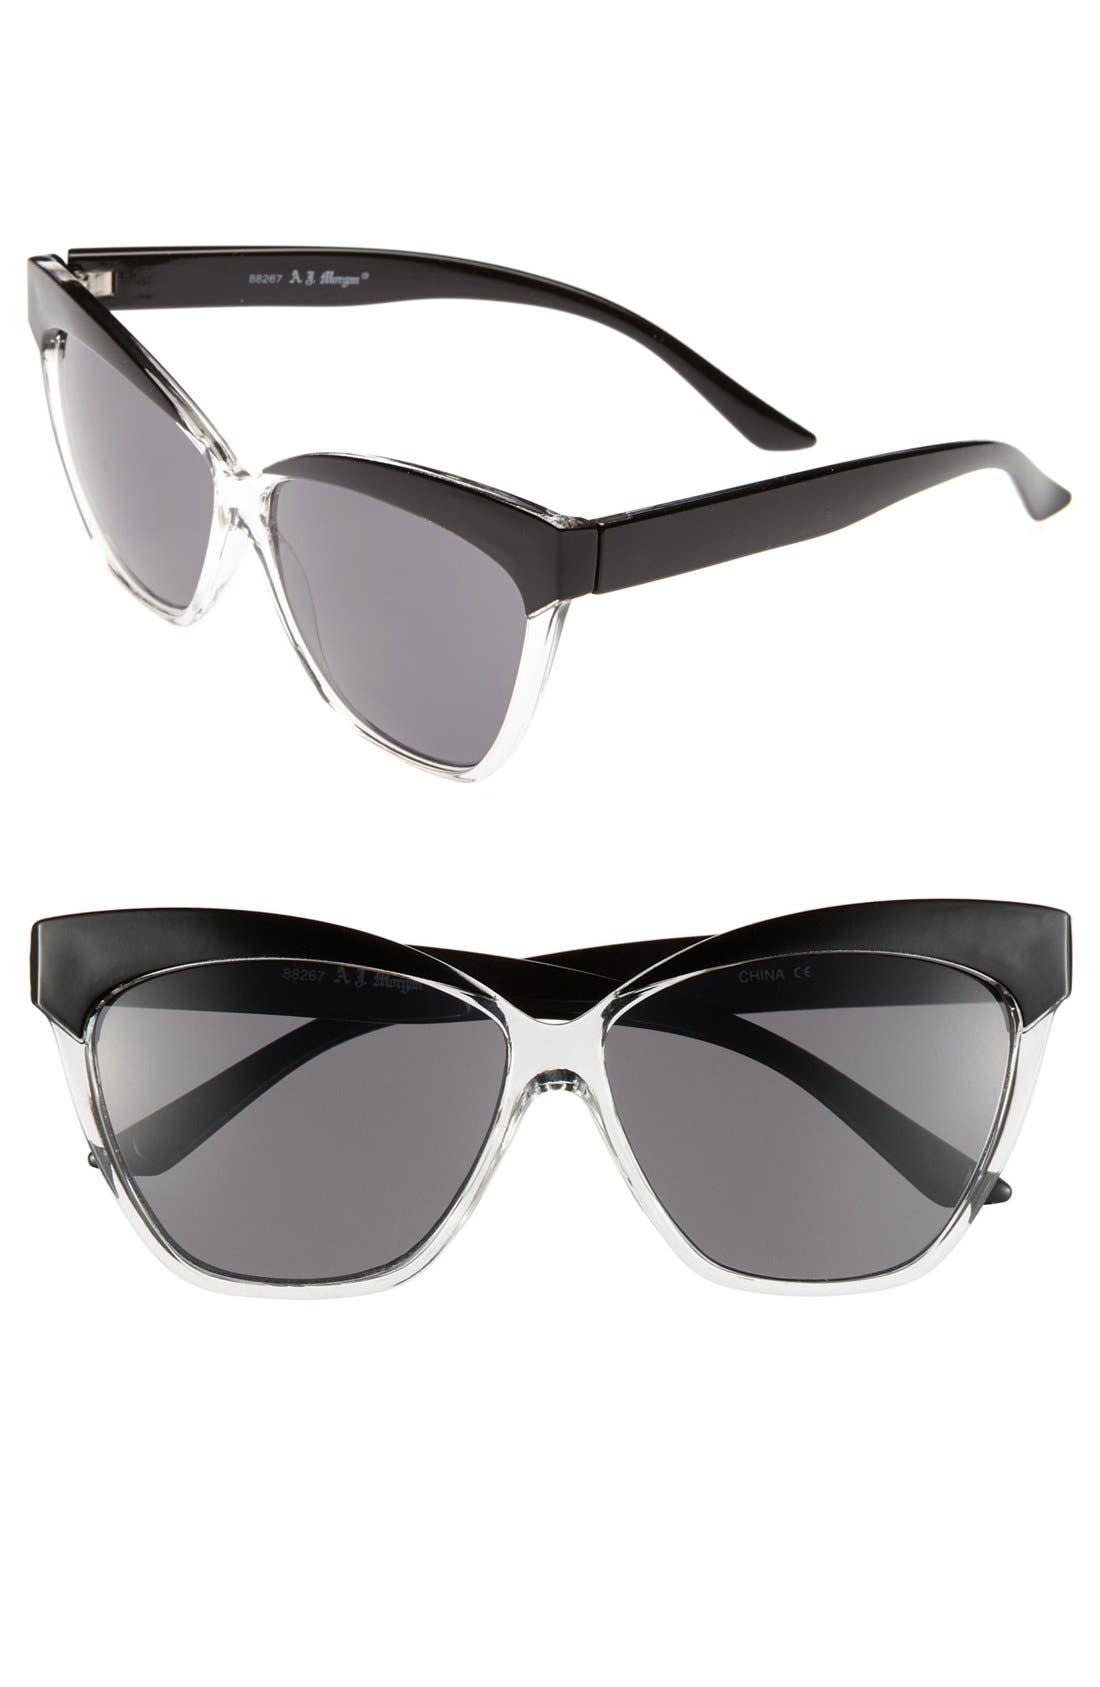 Main Image - A.J. Morgan 'Hunny Bunny' Sunglasses